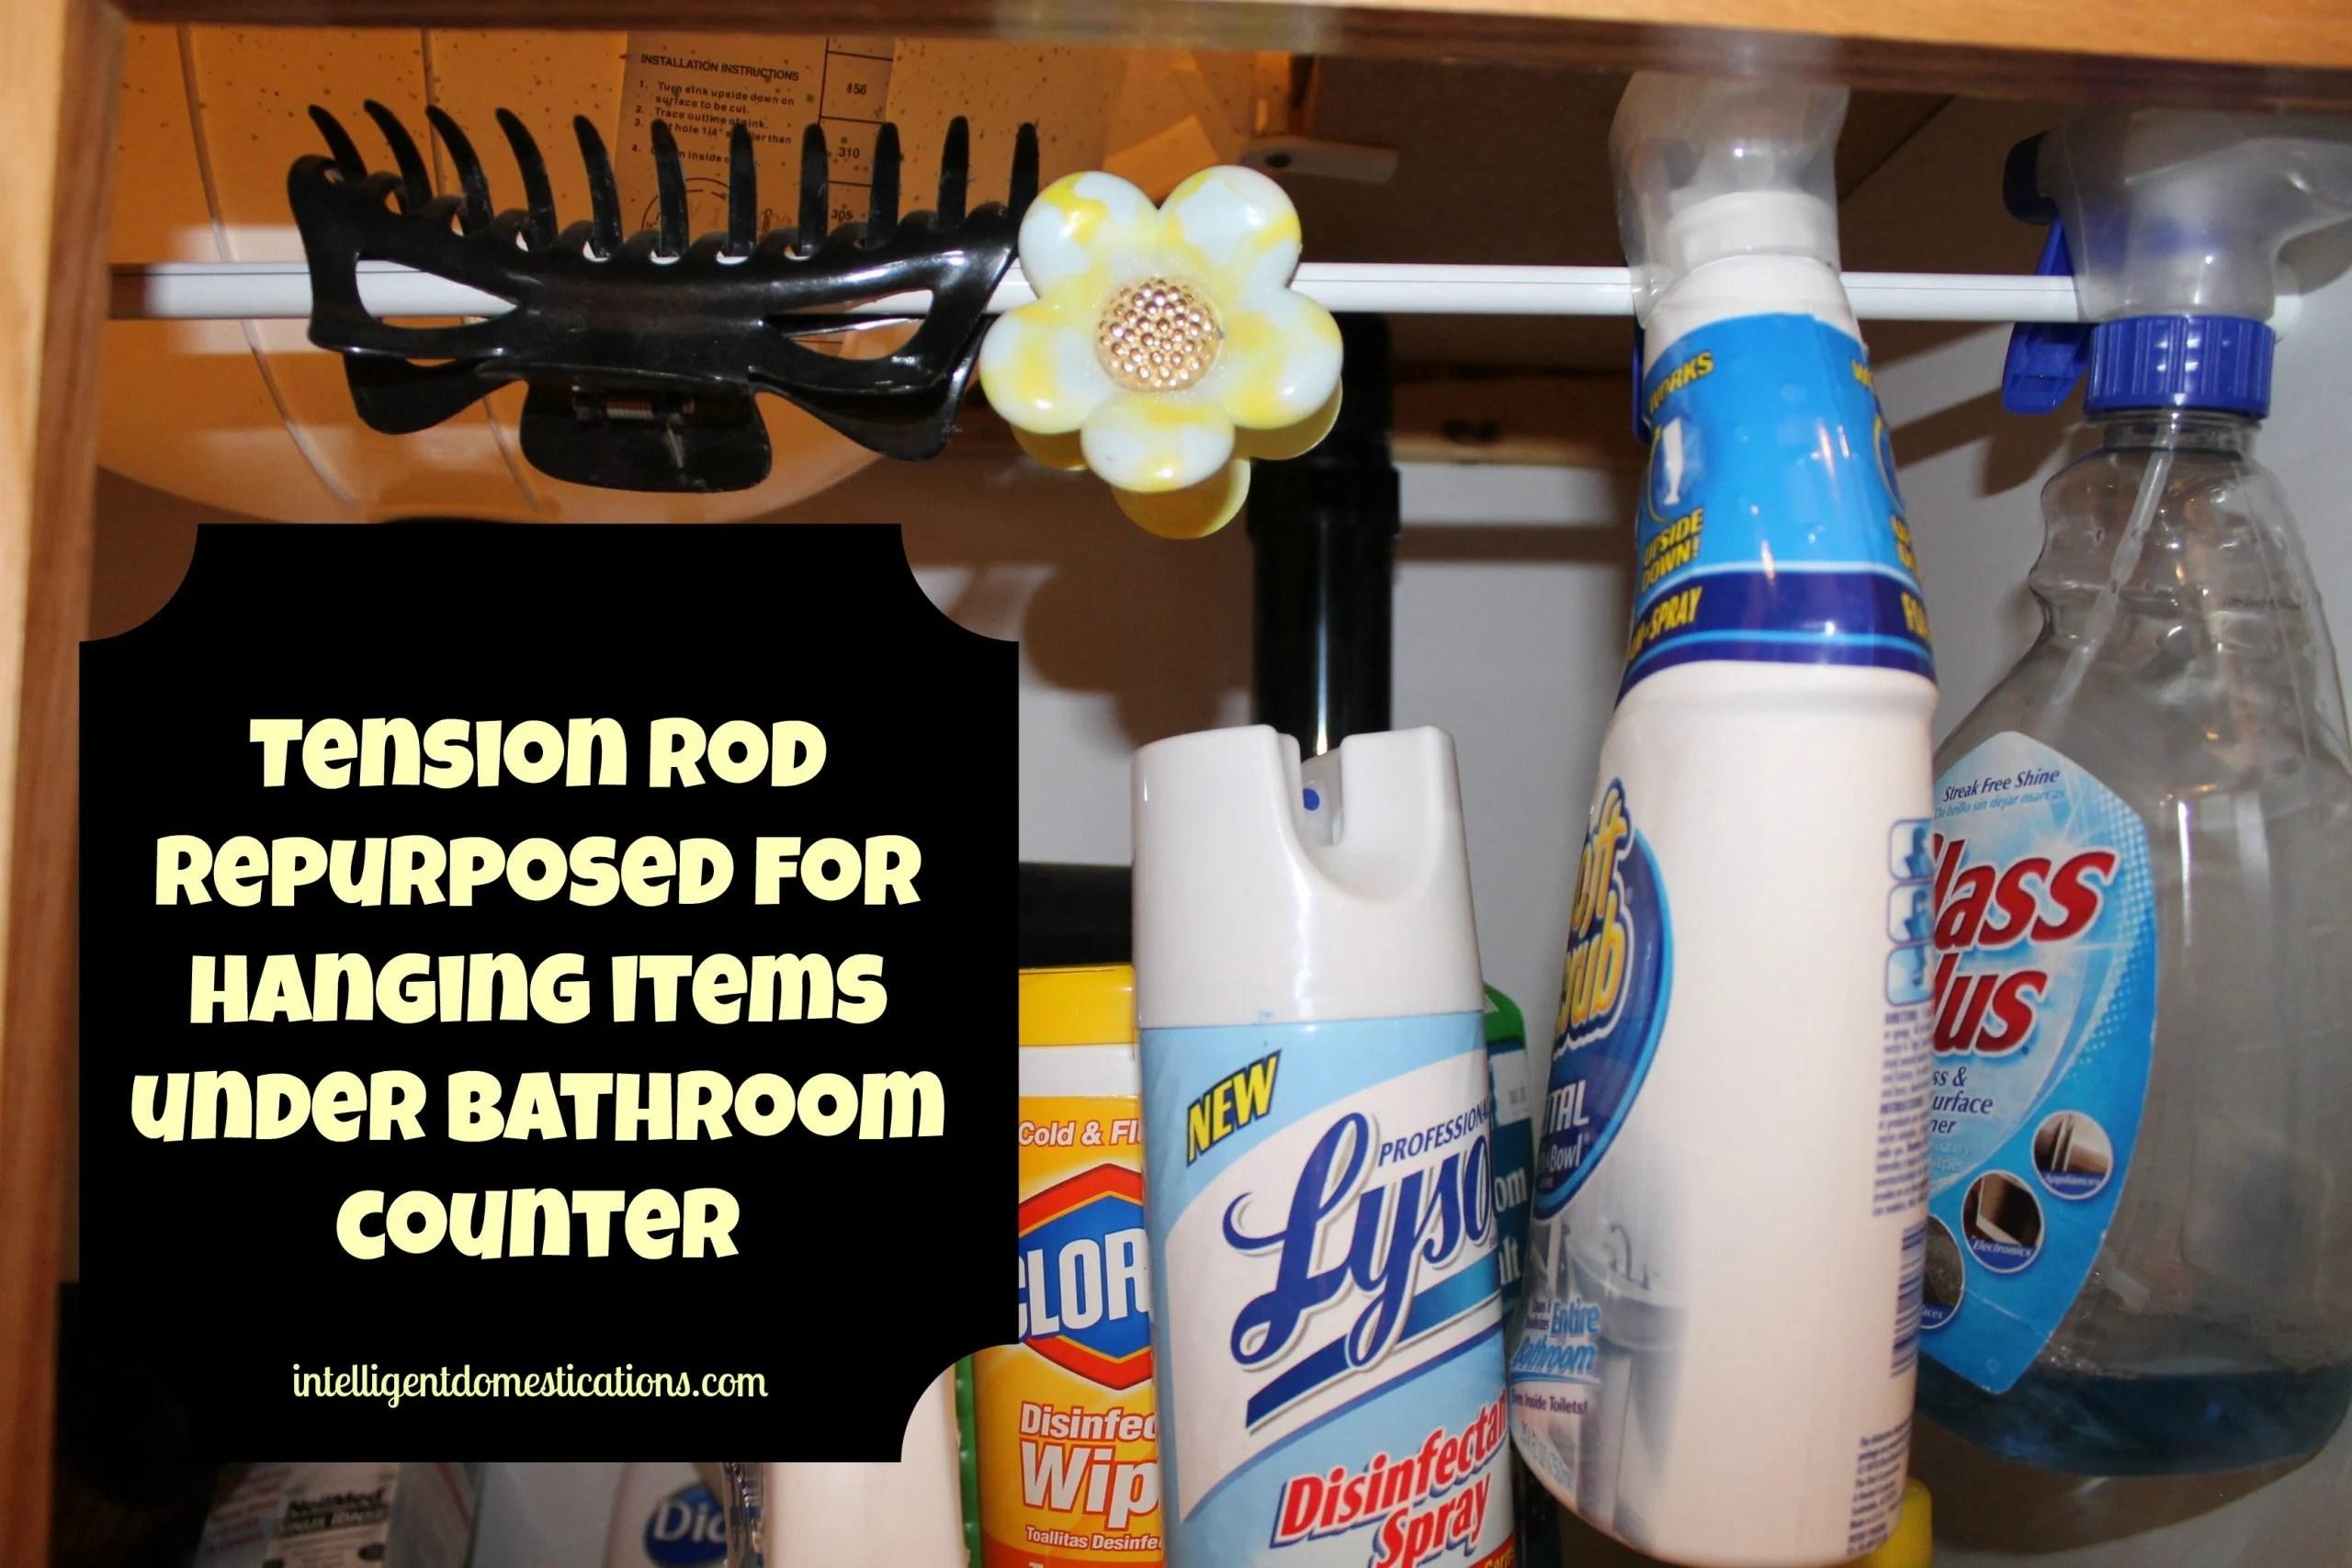 Repurposed Items 5 Common Household Items Repurposed